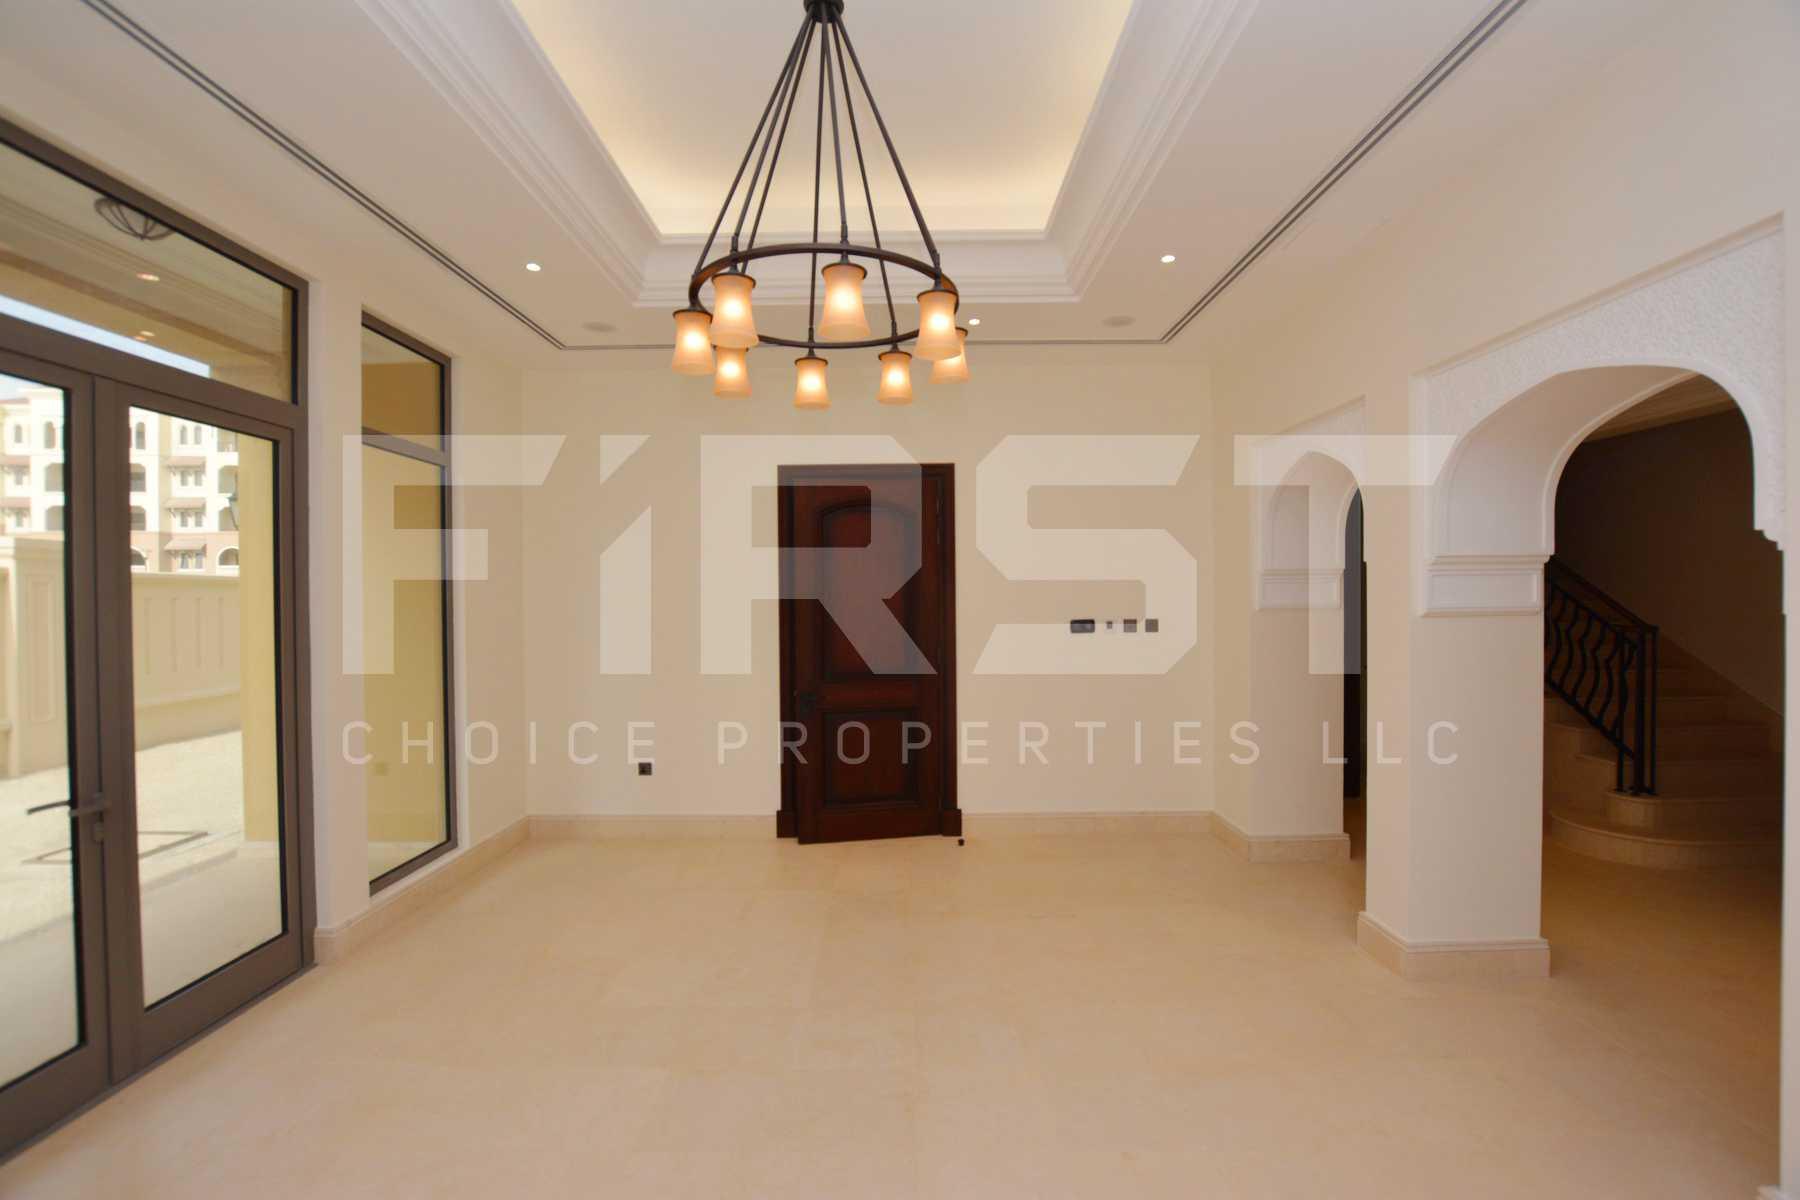 Internal Photo of Delux 5 Bedroom Villa in Saadiyat Beach Villas Saadiyat Island Abu Dhabi UAE (10).jpg